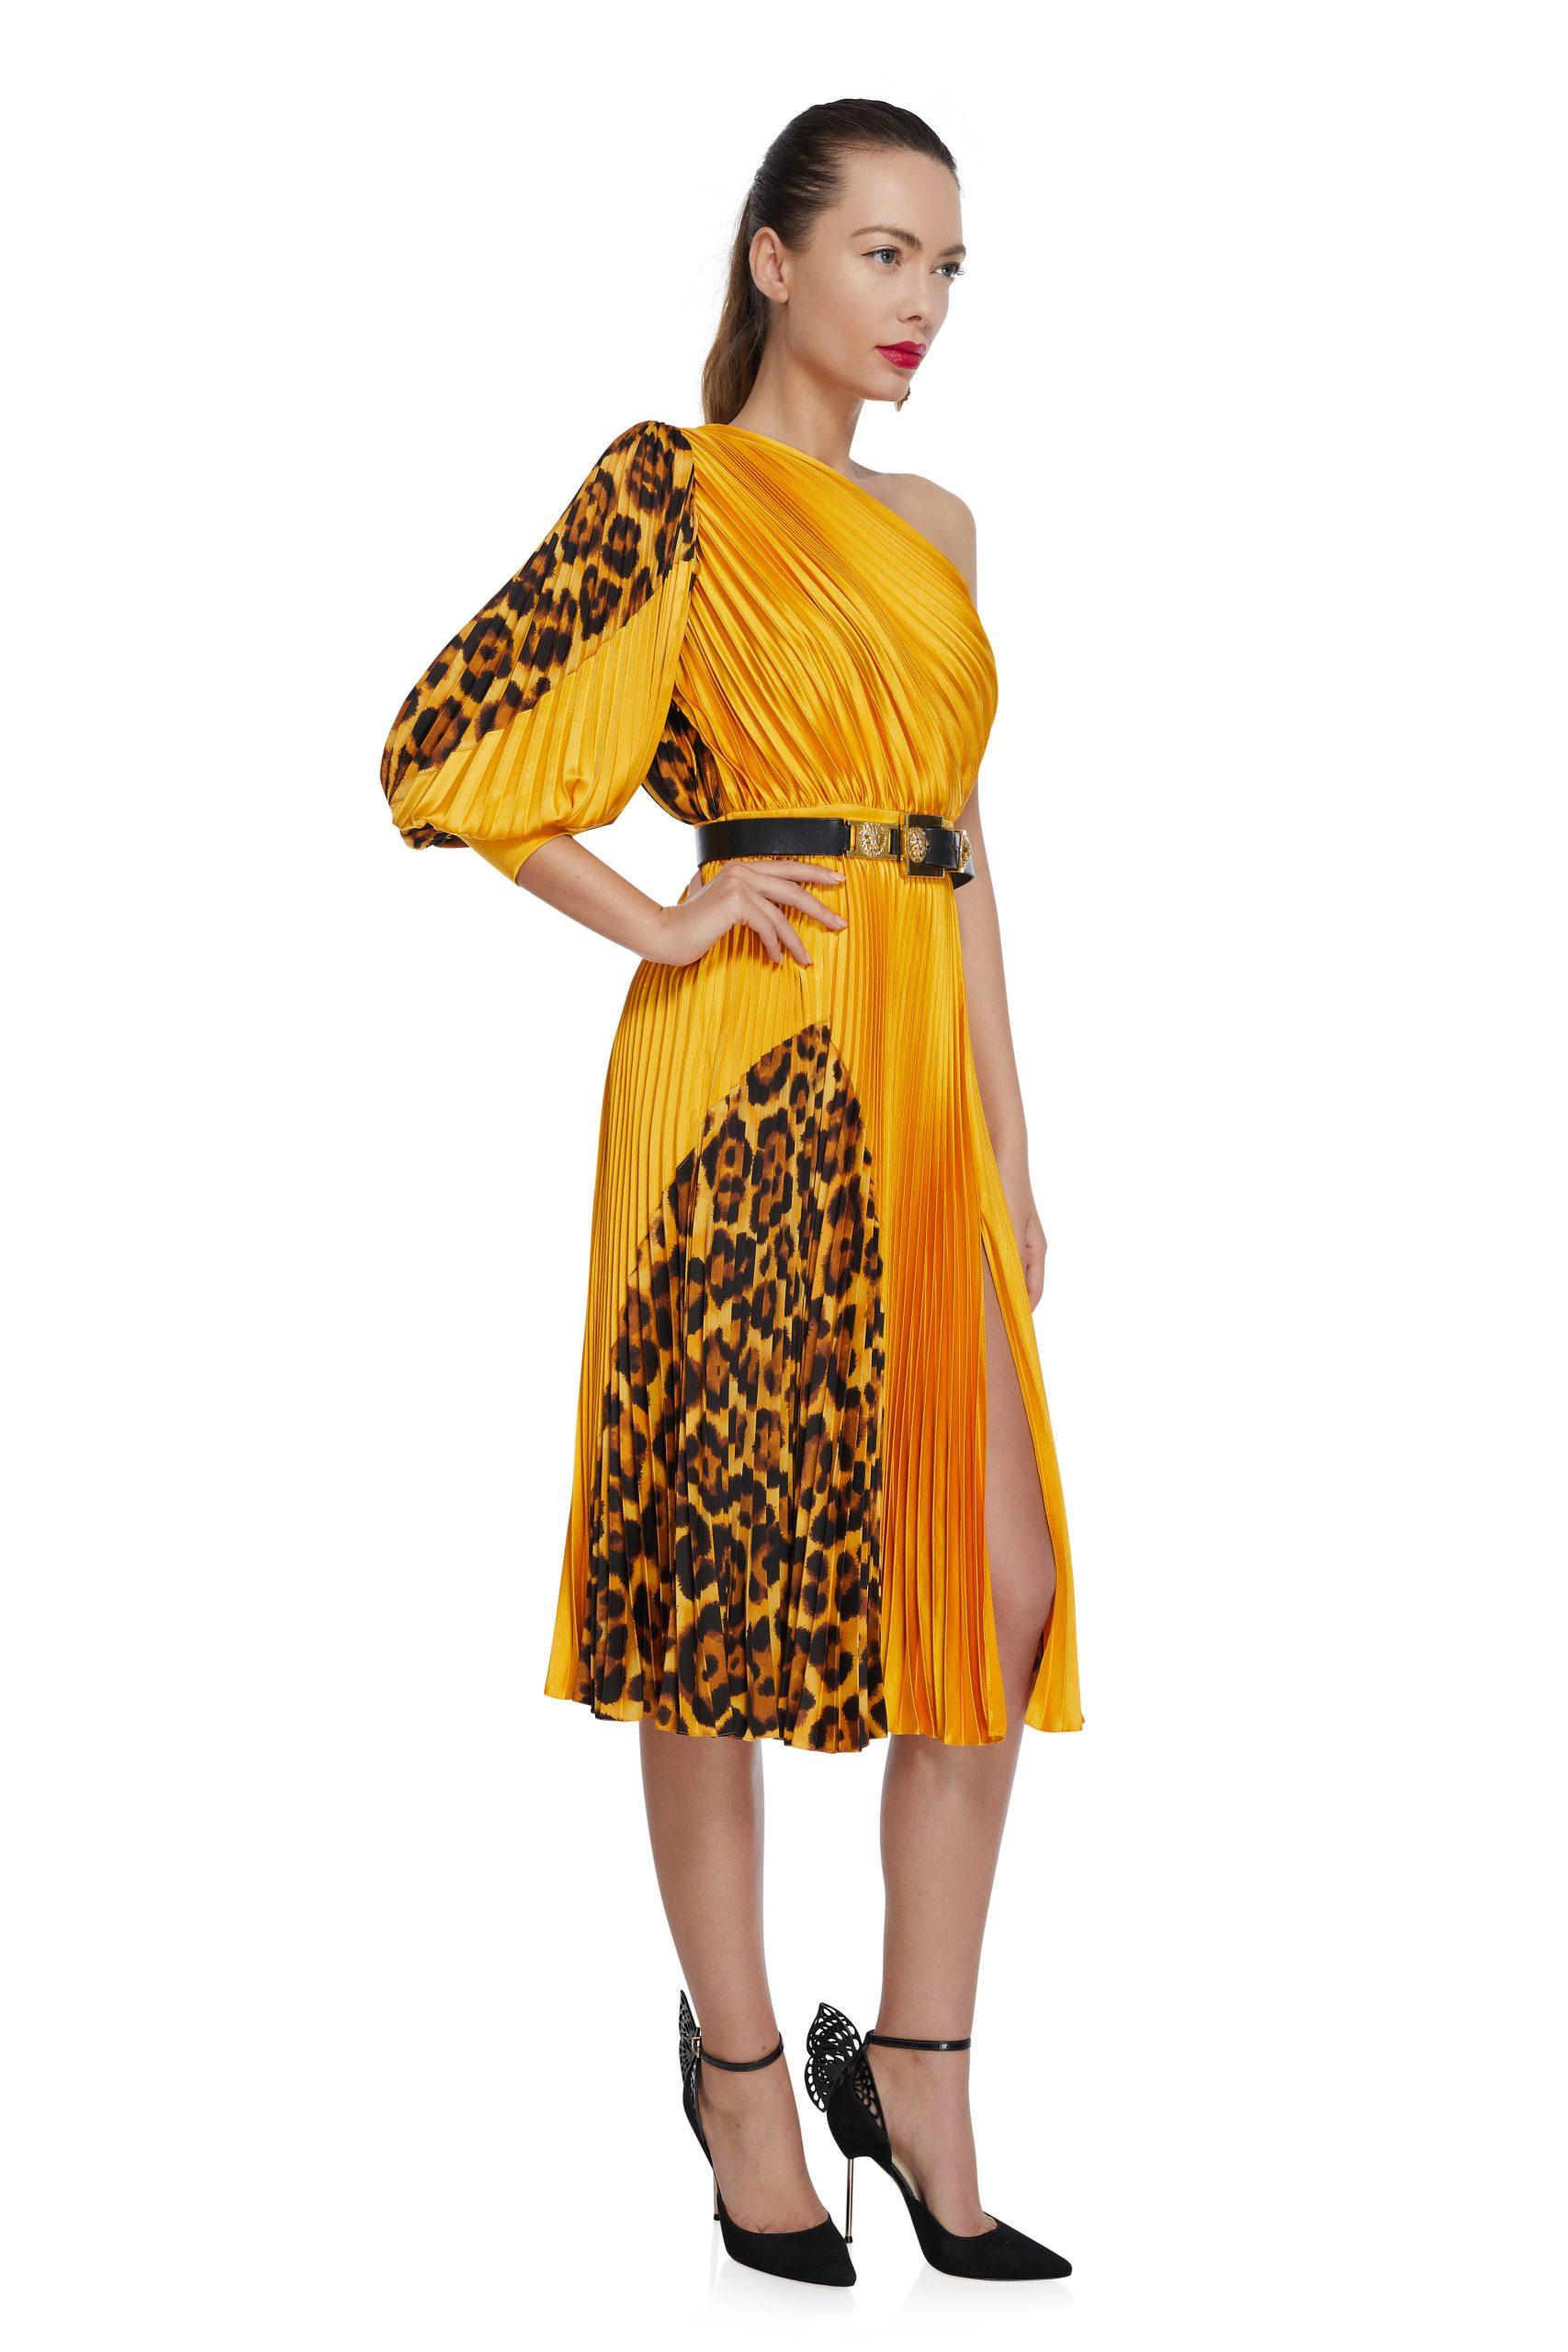 Animal print cocktail dress